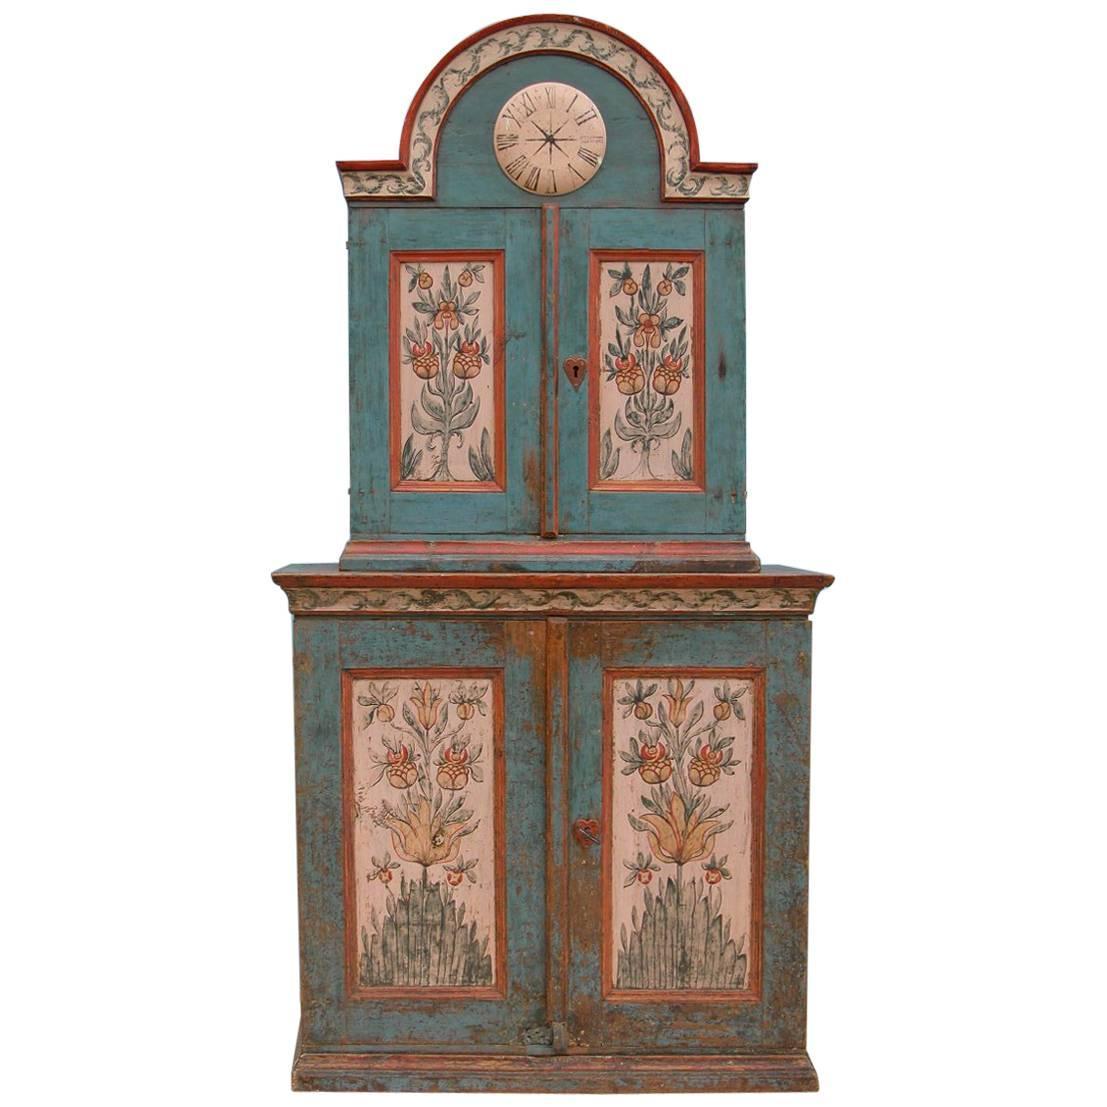 Rare Swedish 'Skånkskåp' Allmoge Cabinet, Dalarna, Sweden, Circa 1800